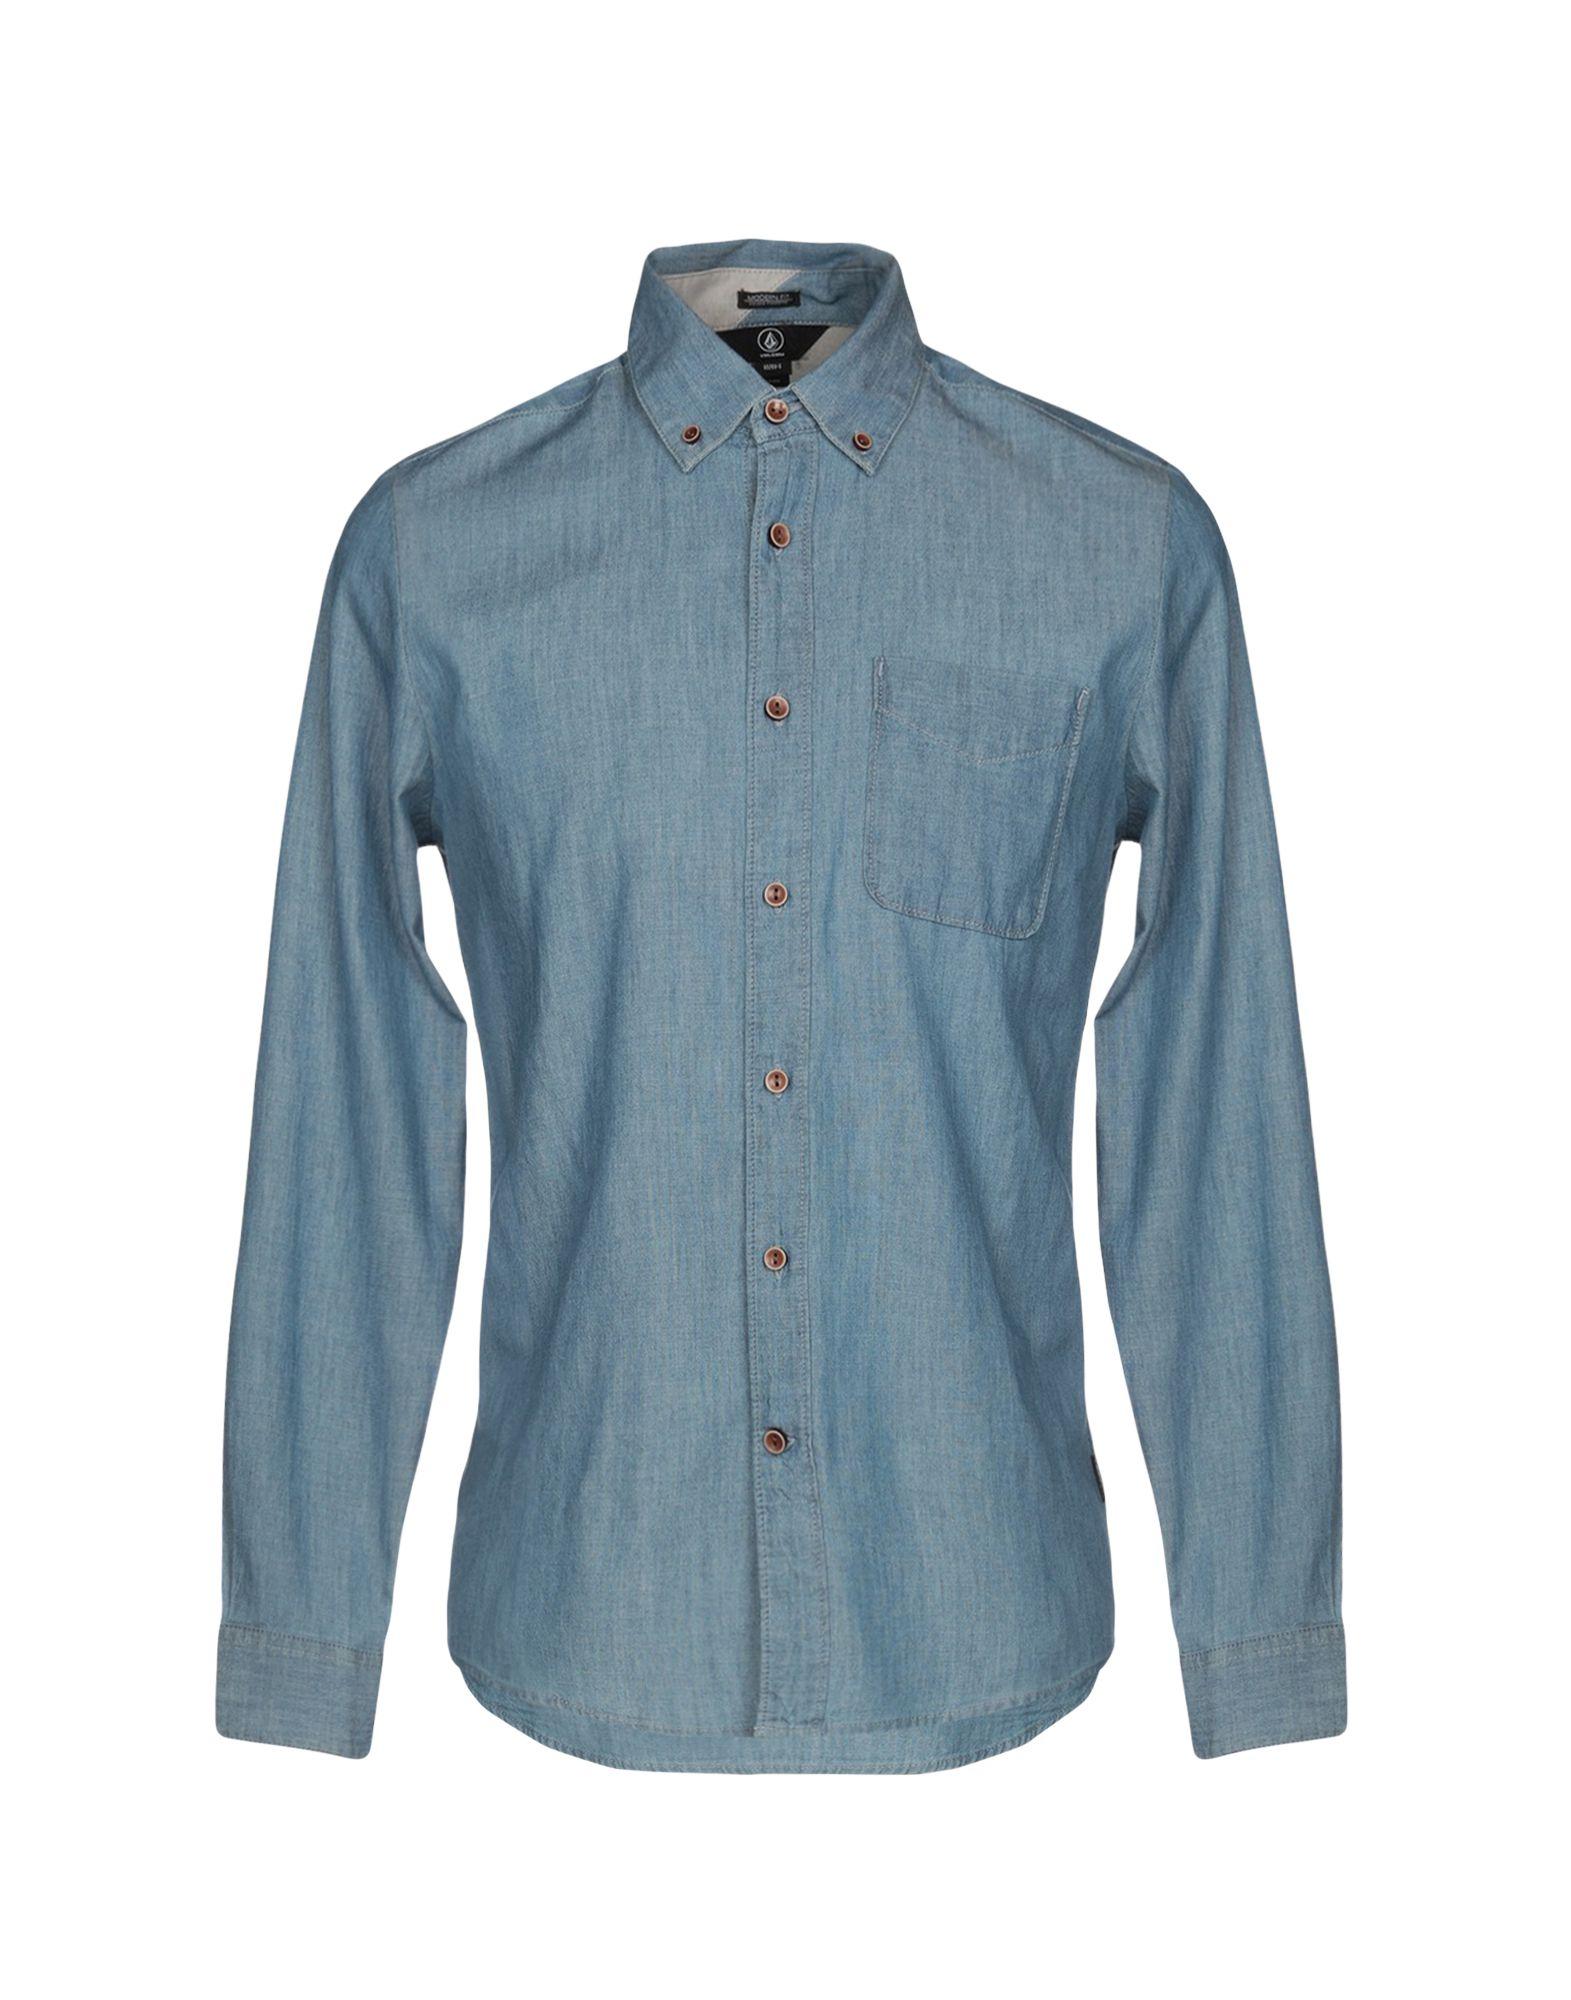 VOLCOM Джинсовая рубашка volcom рубашка volcom hadley solid ash blue l